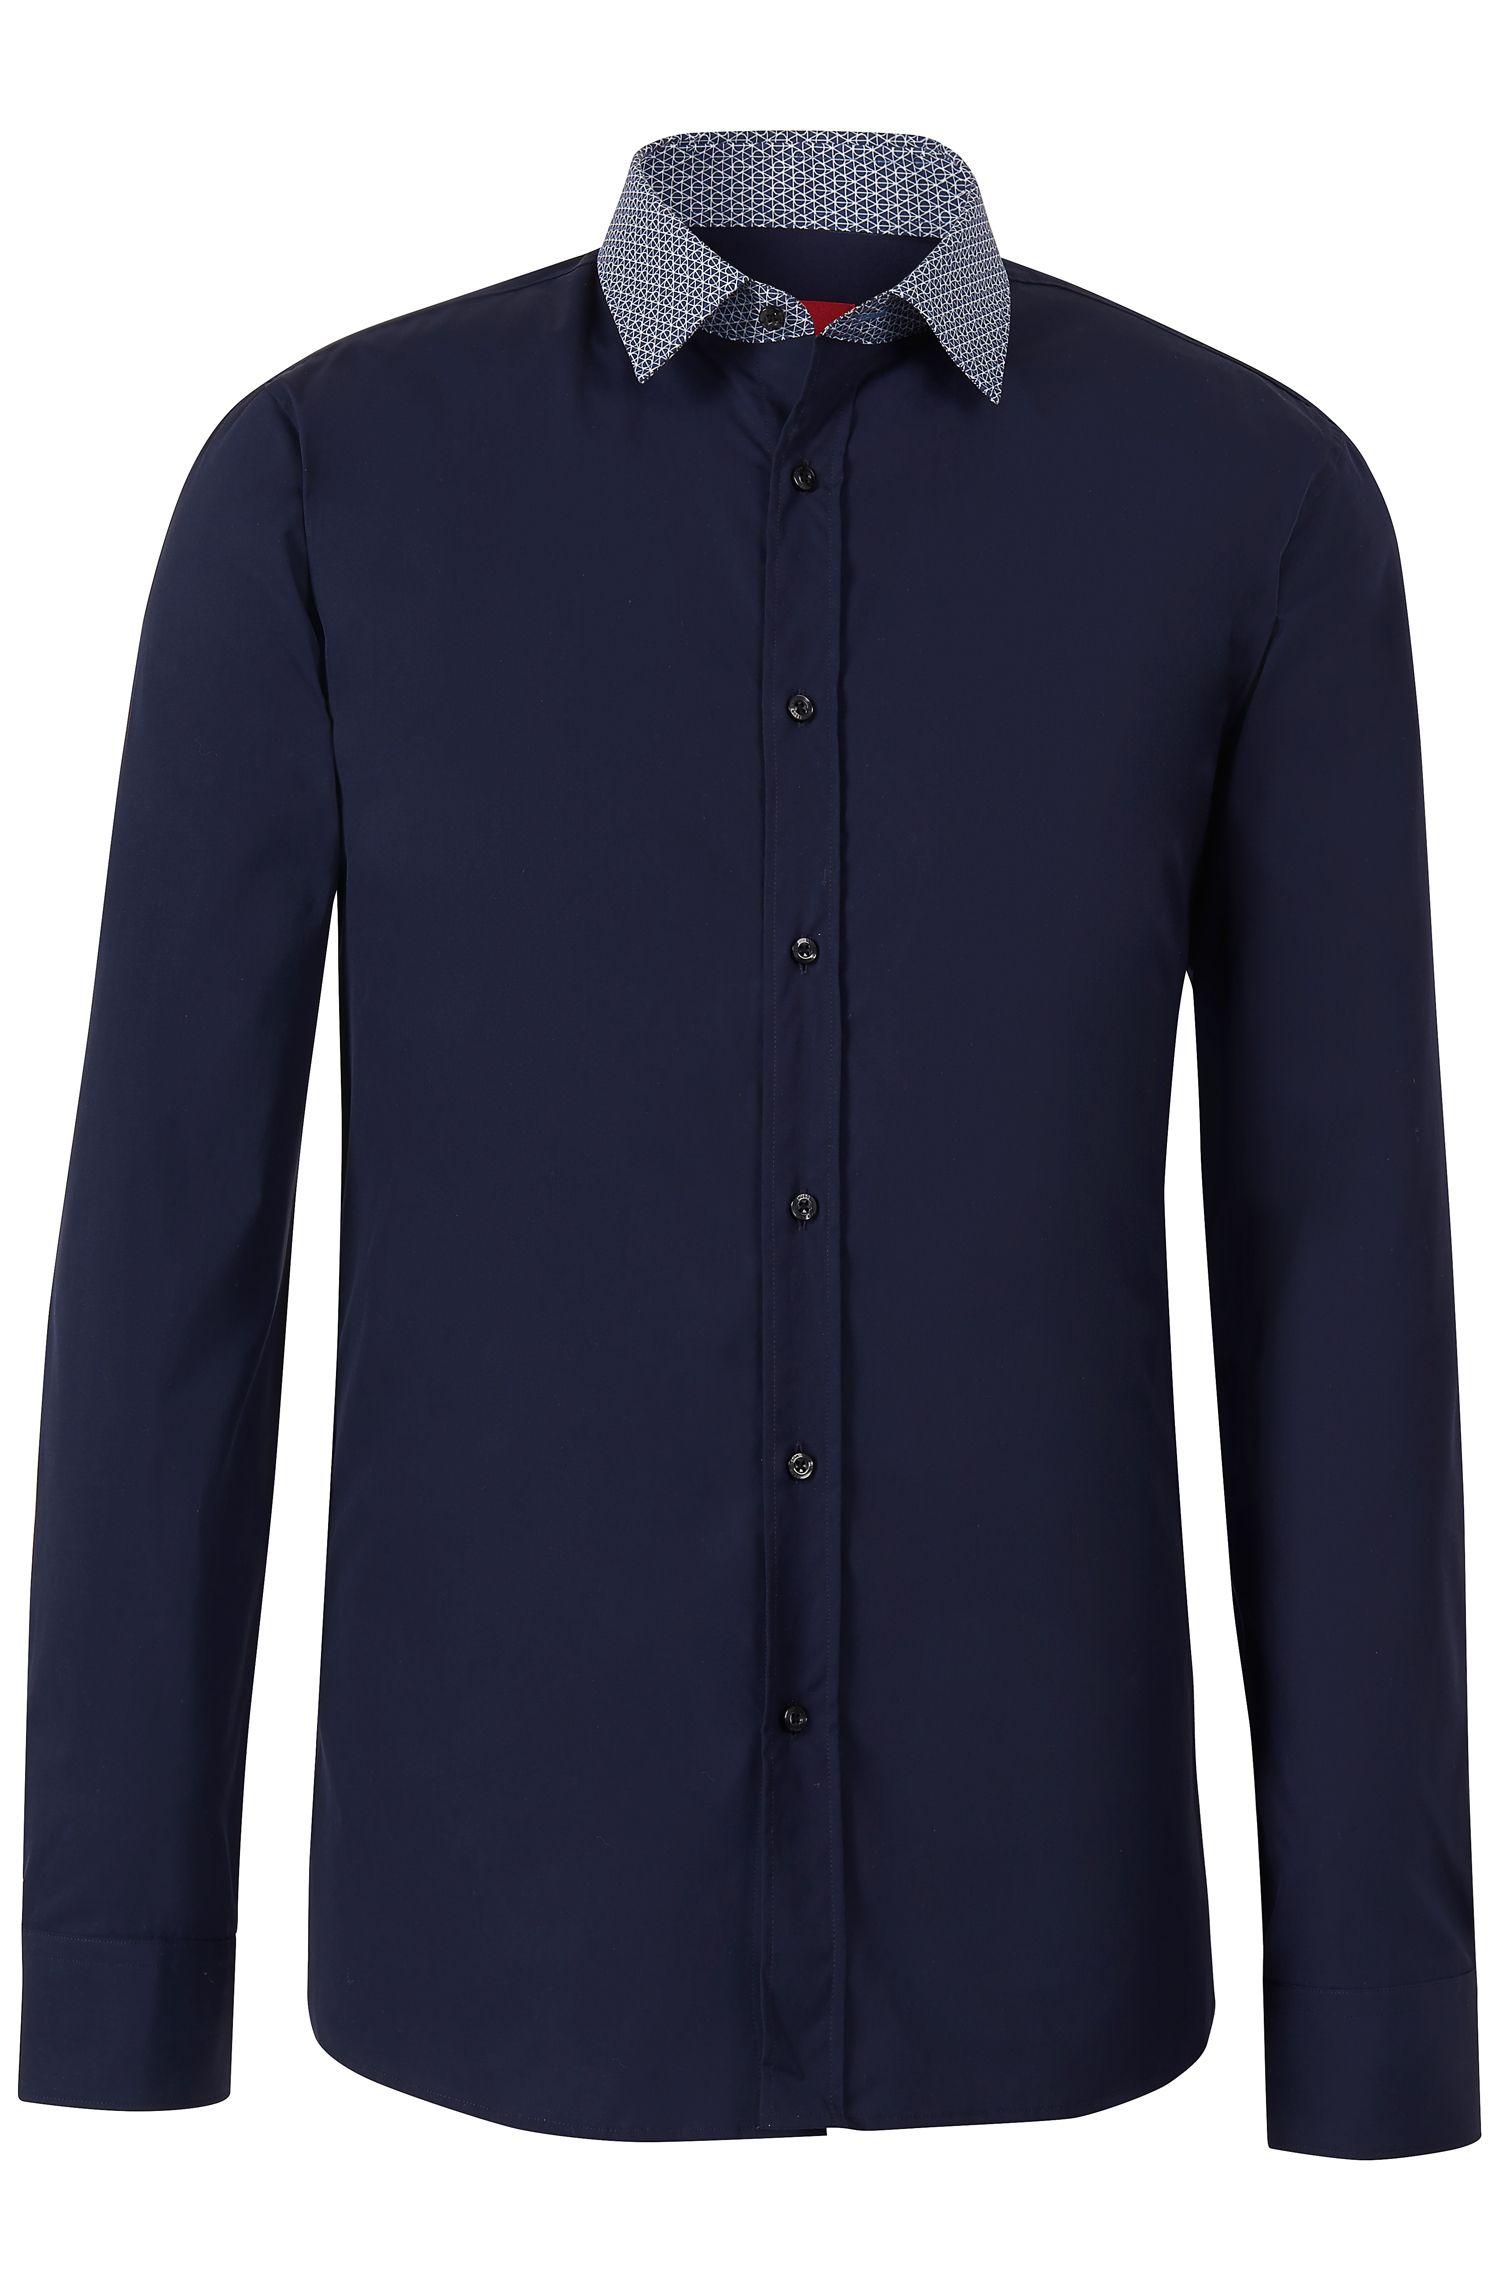 'Elisha' | Slim Fit, Cotton Button Down Shirt